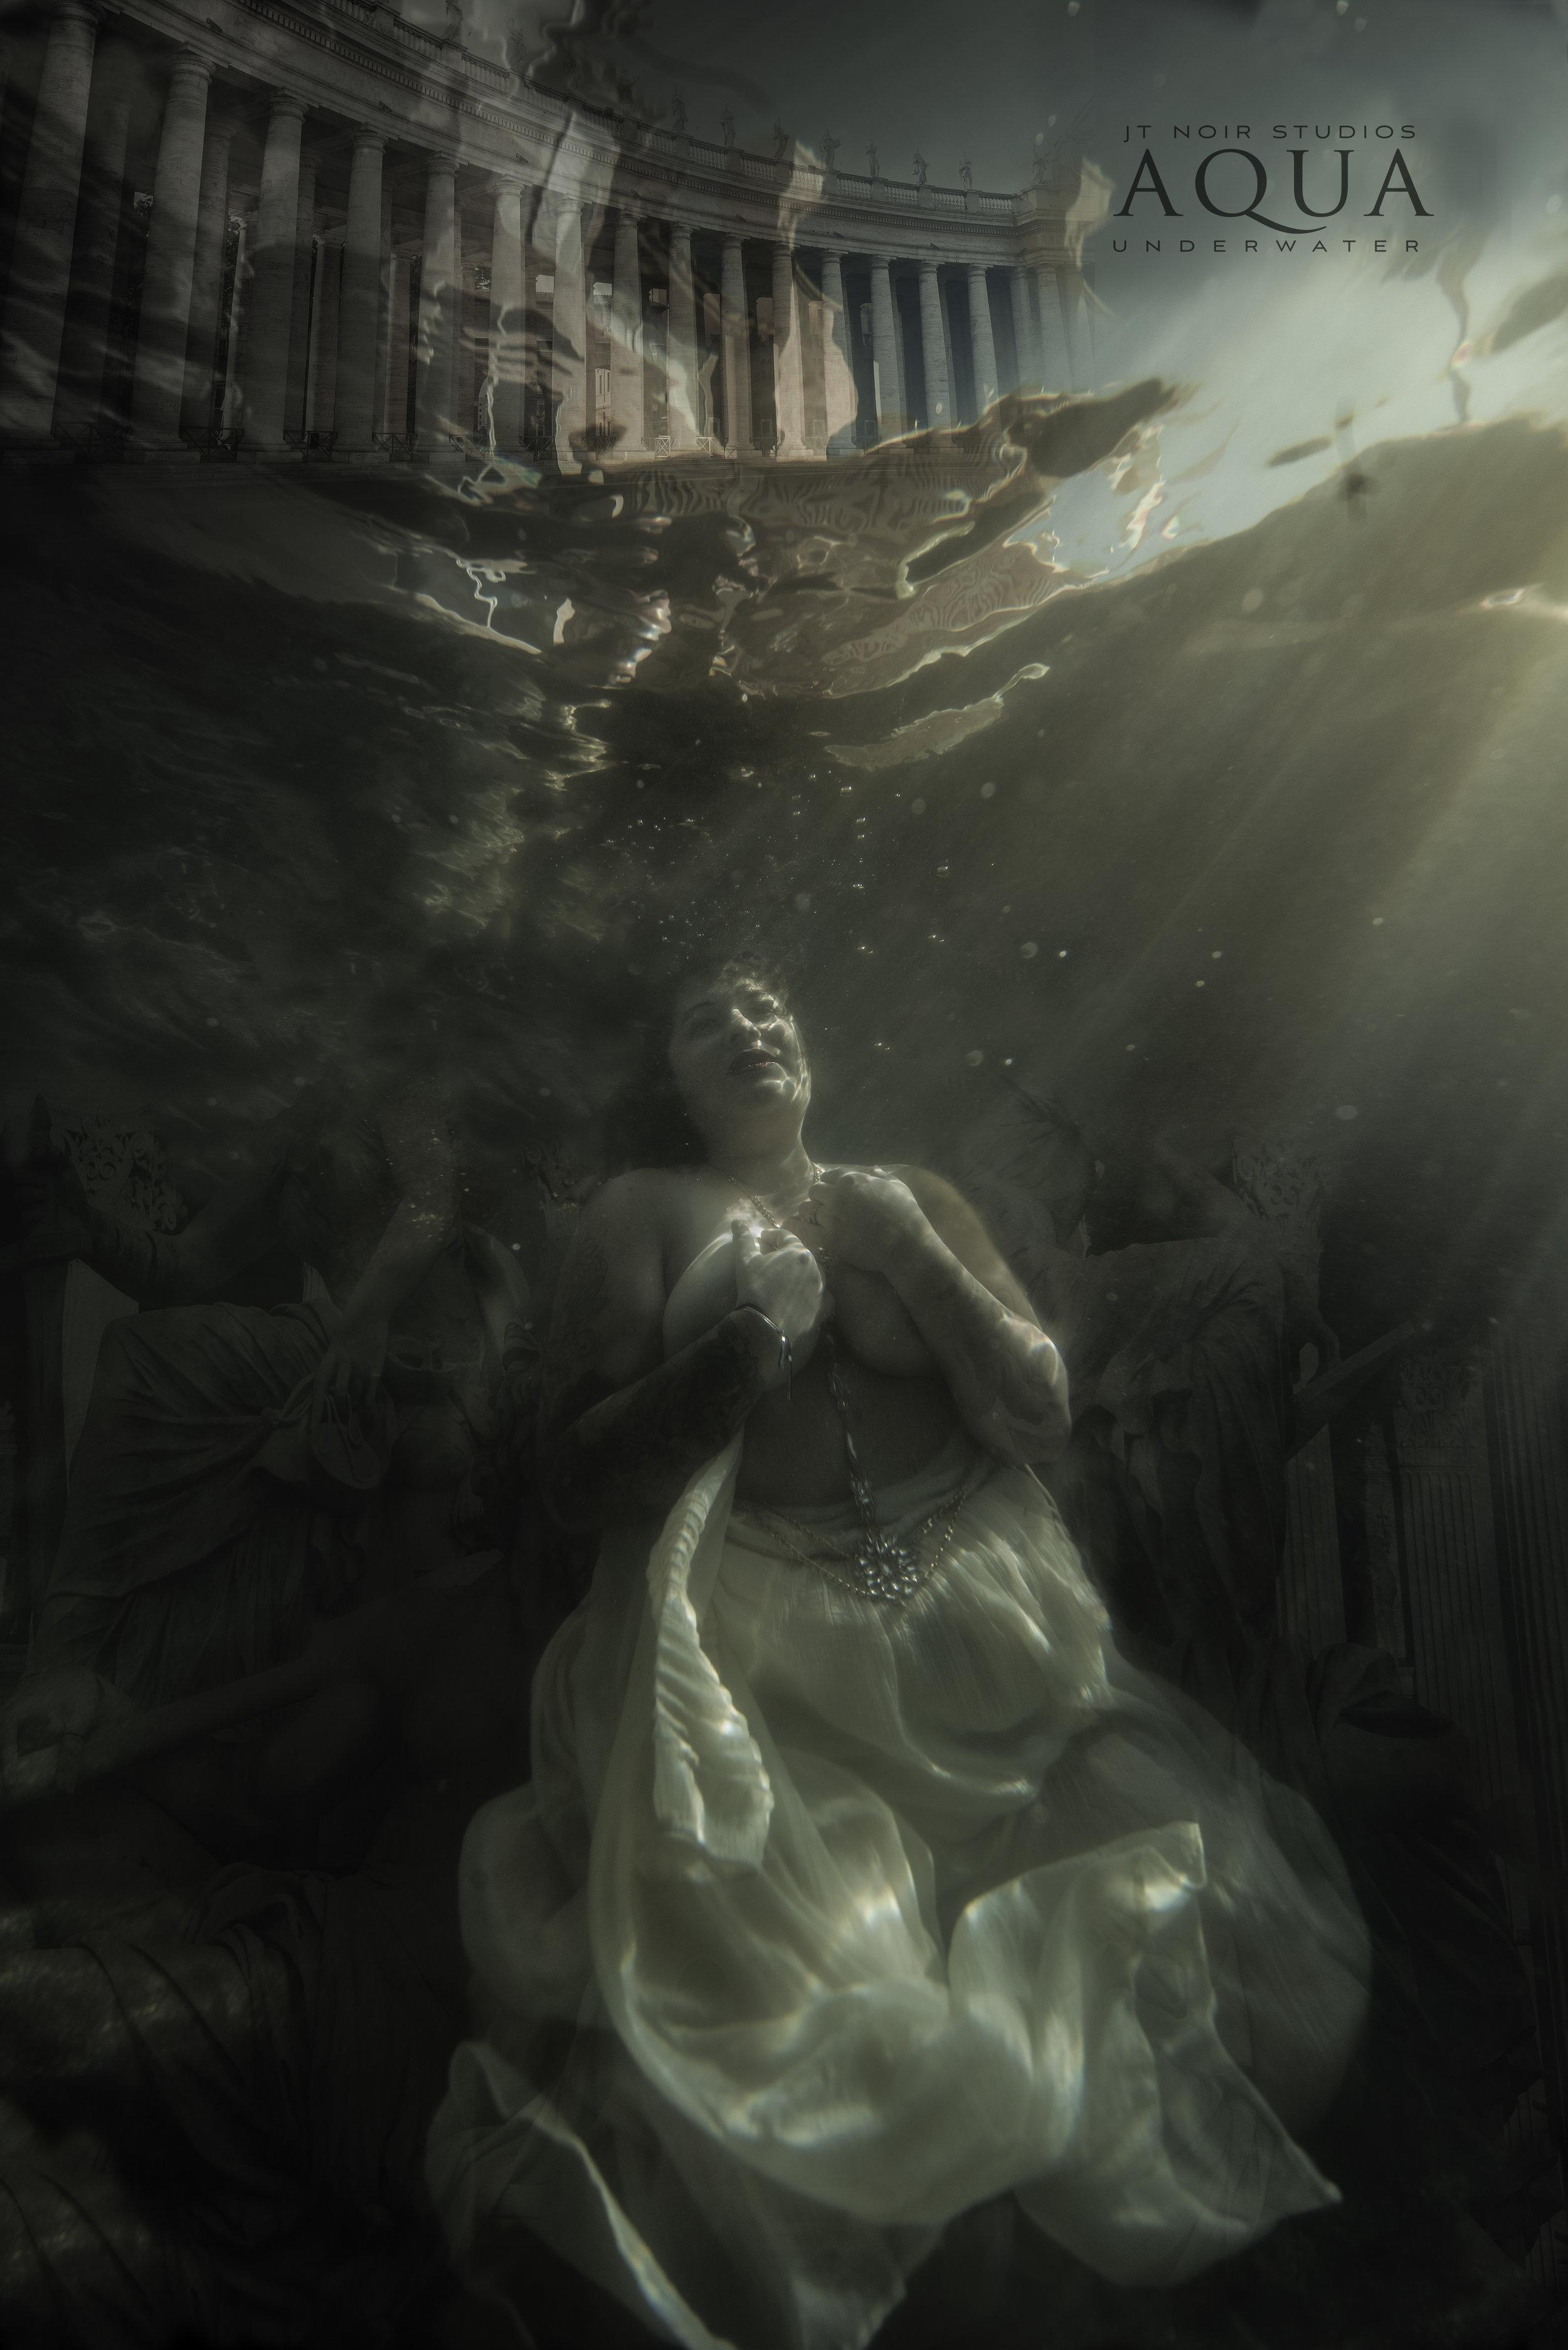 JTAqua_Underwater_Elizabeth_GreekGodess.jpg